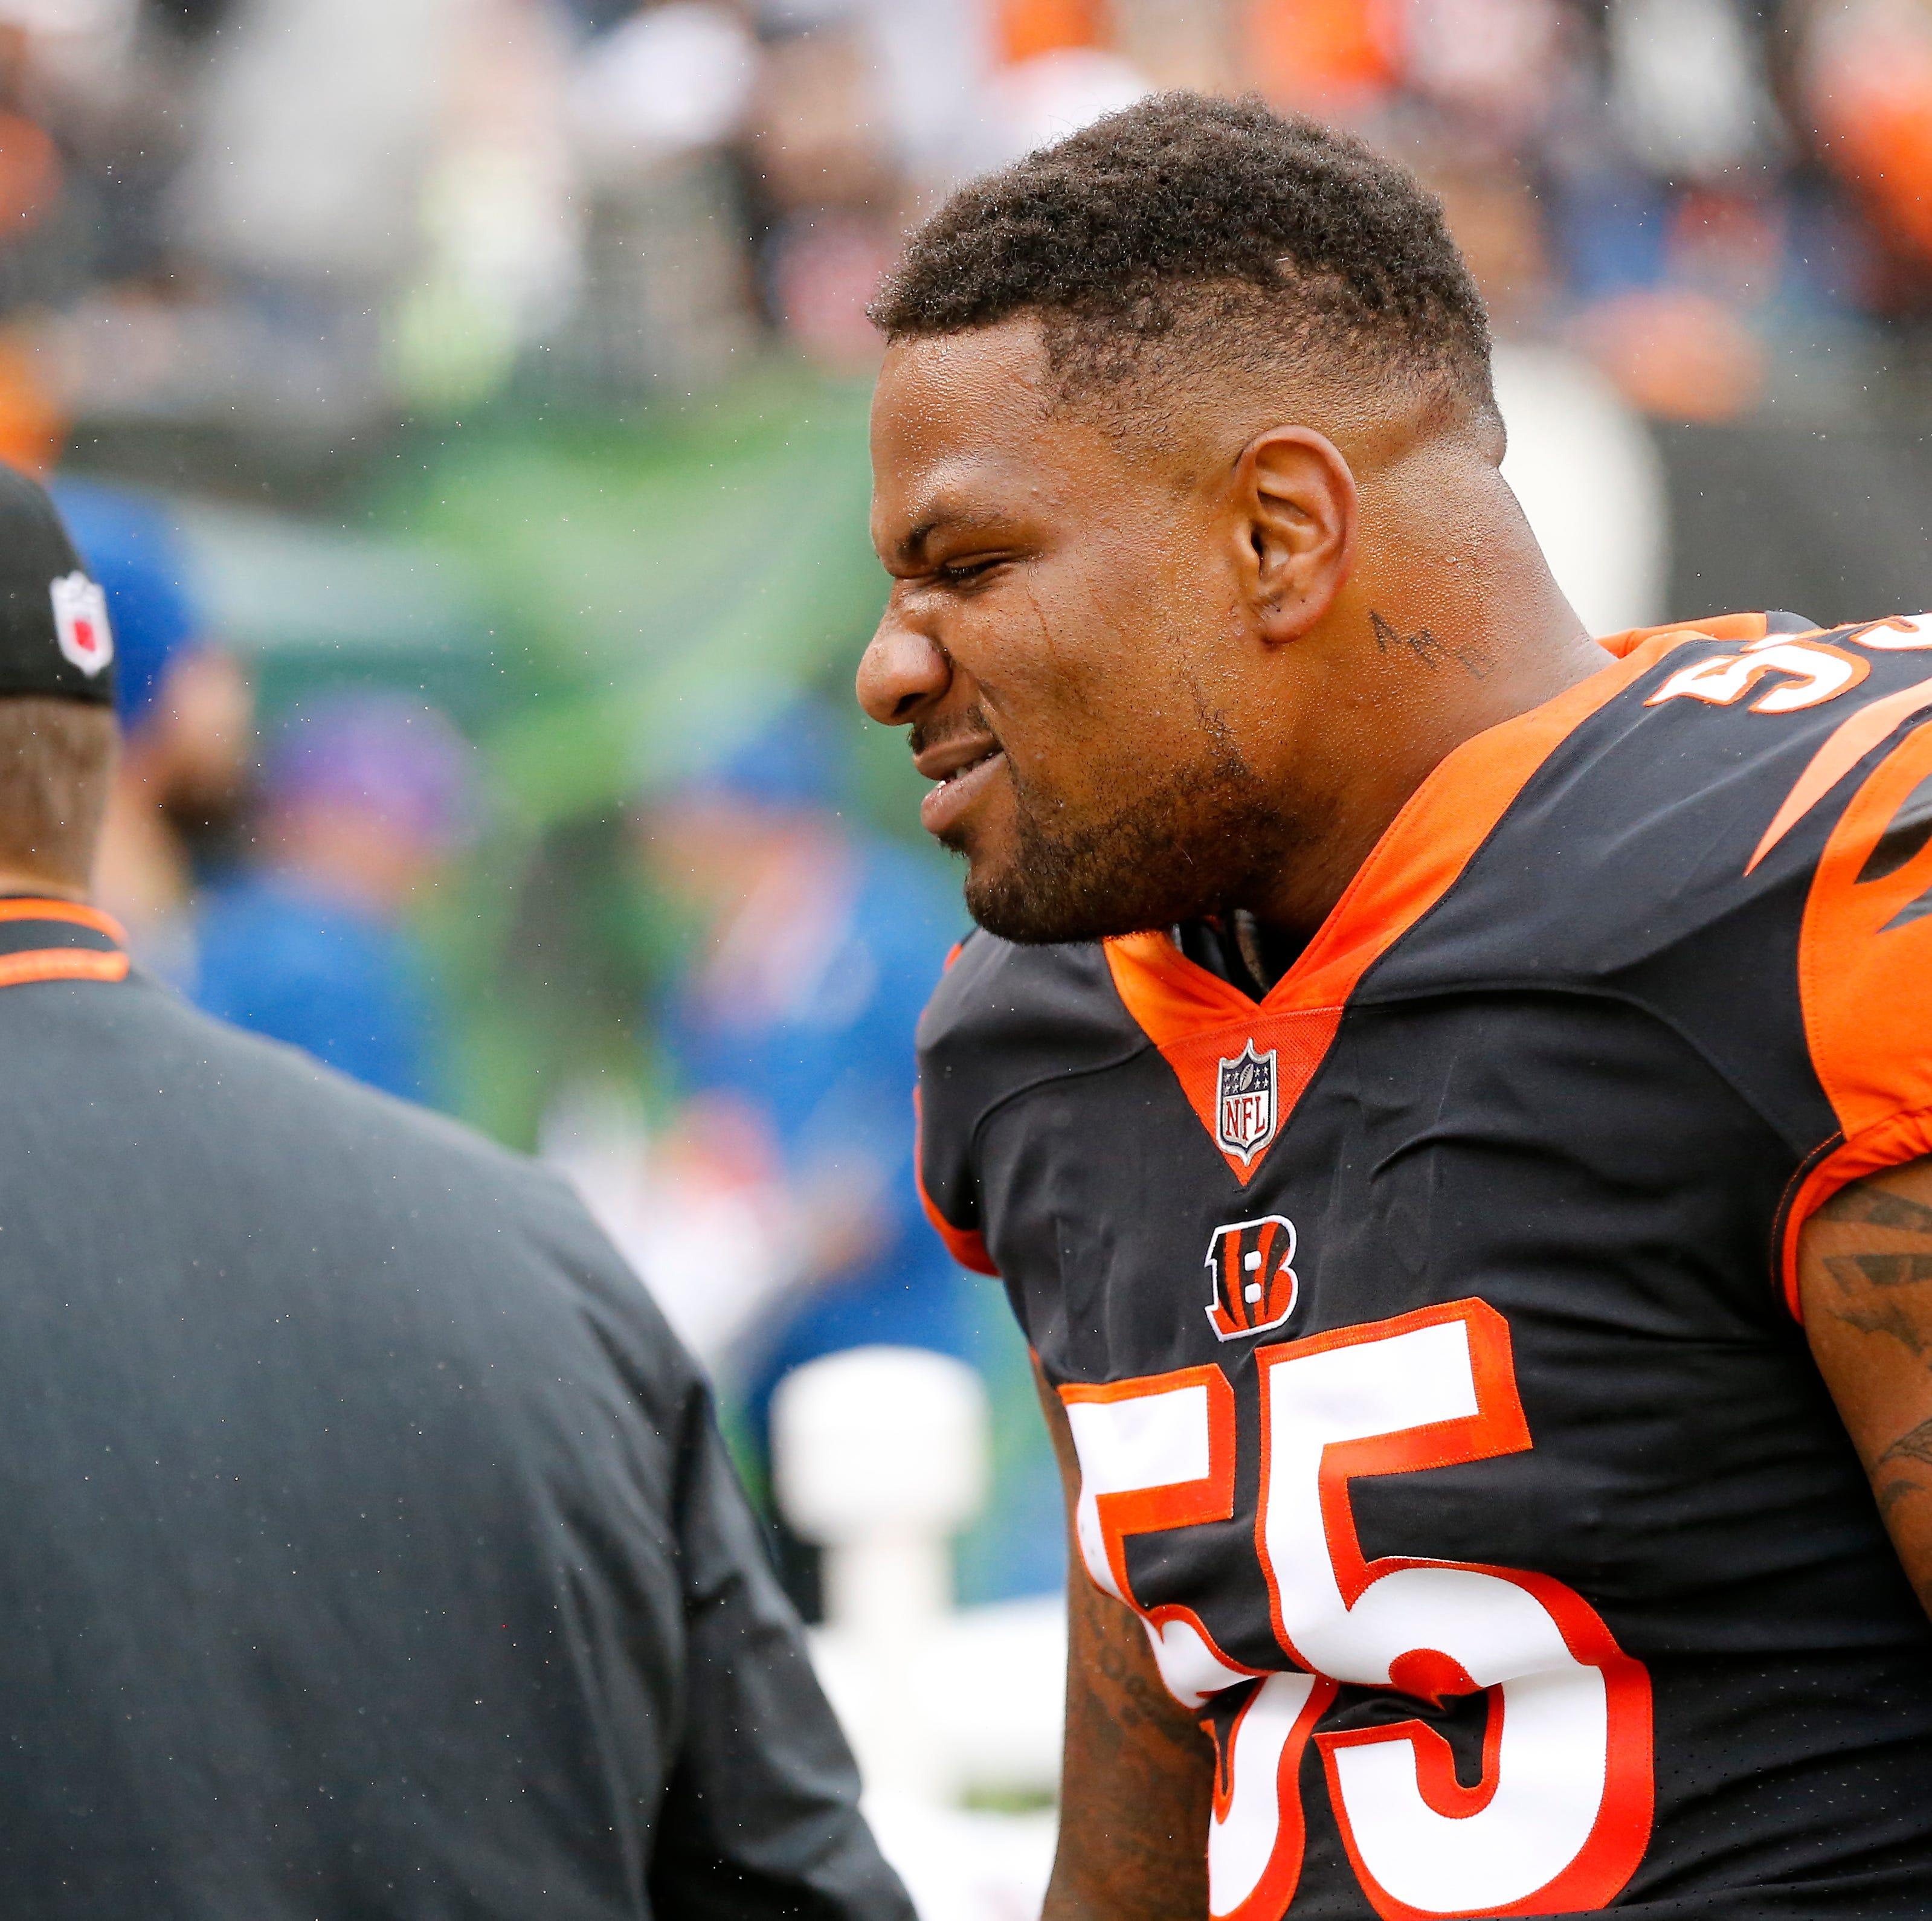 Report: NFL fines Cincinnati Bengals LB Vontaze Burfict again